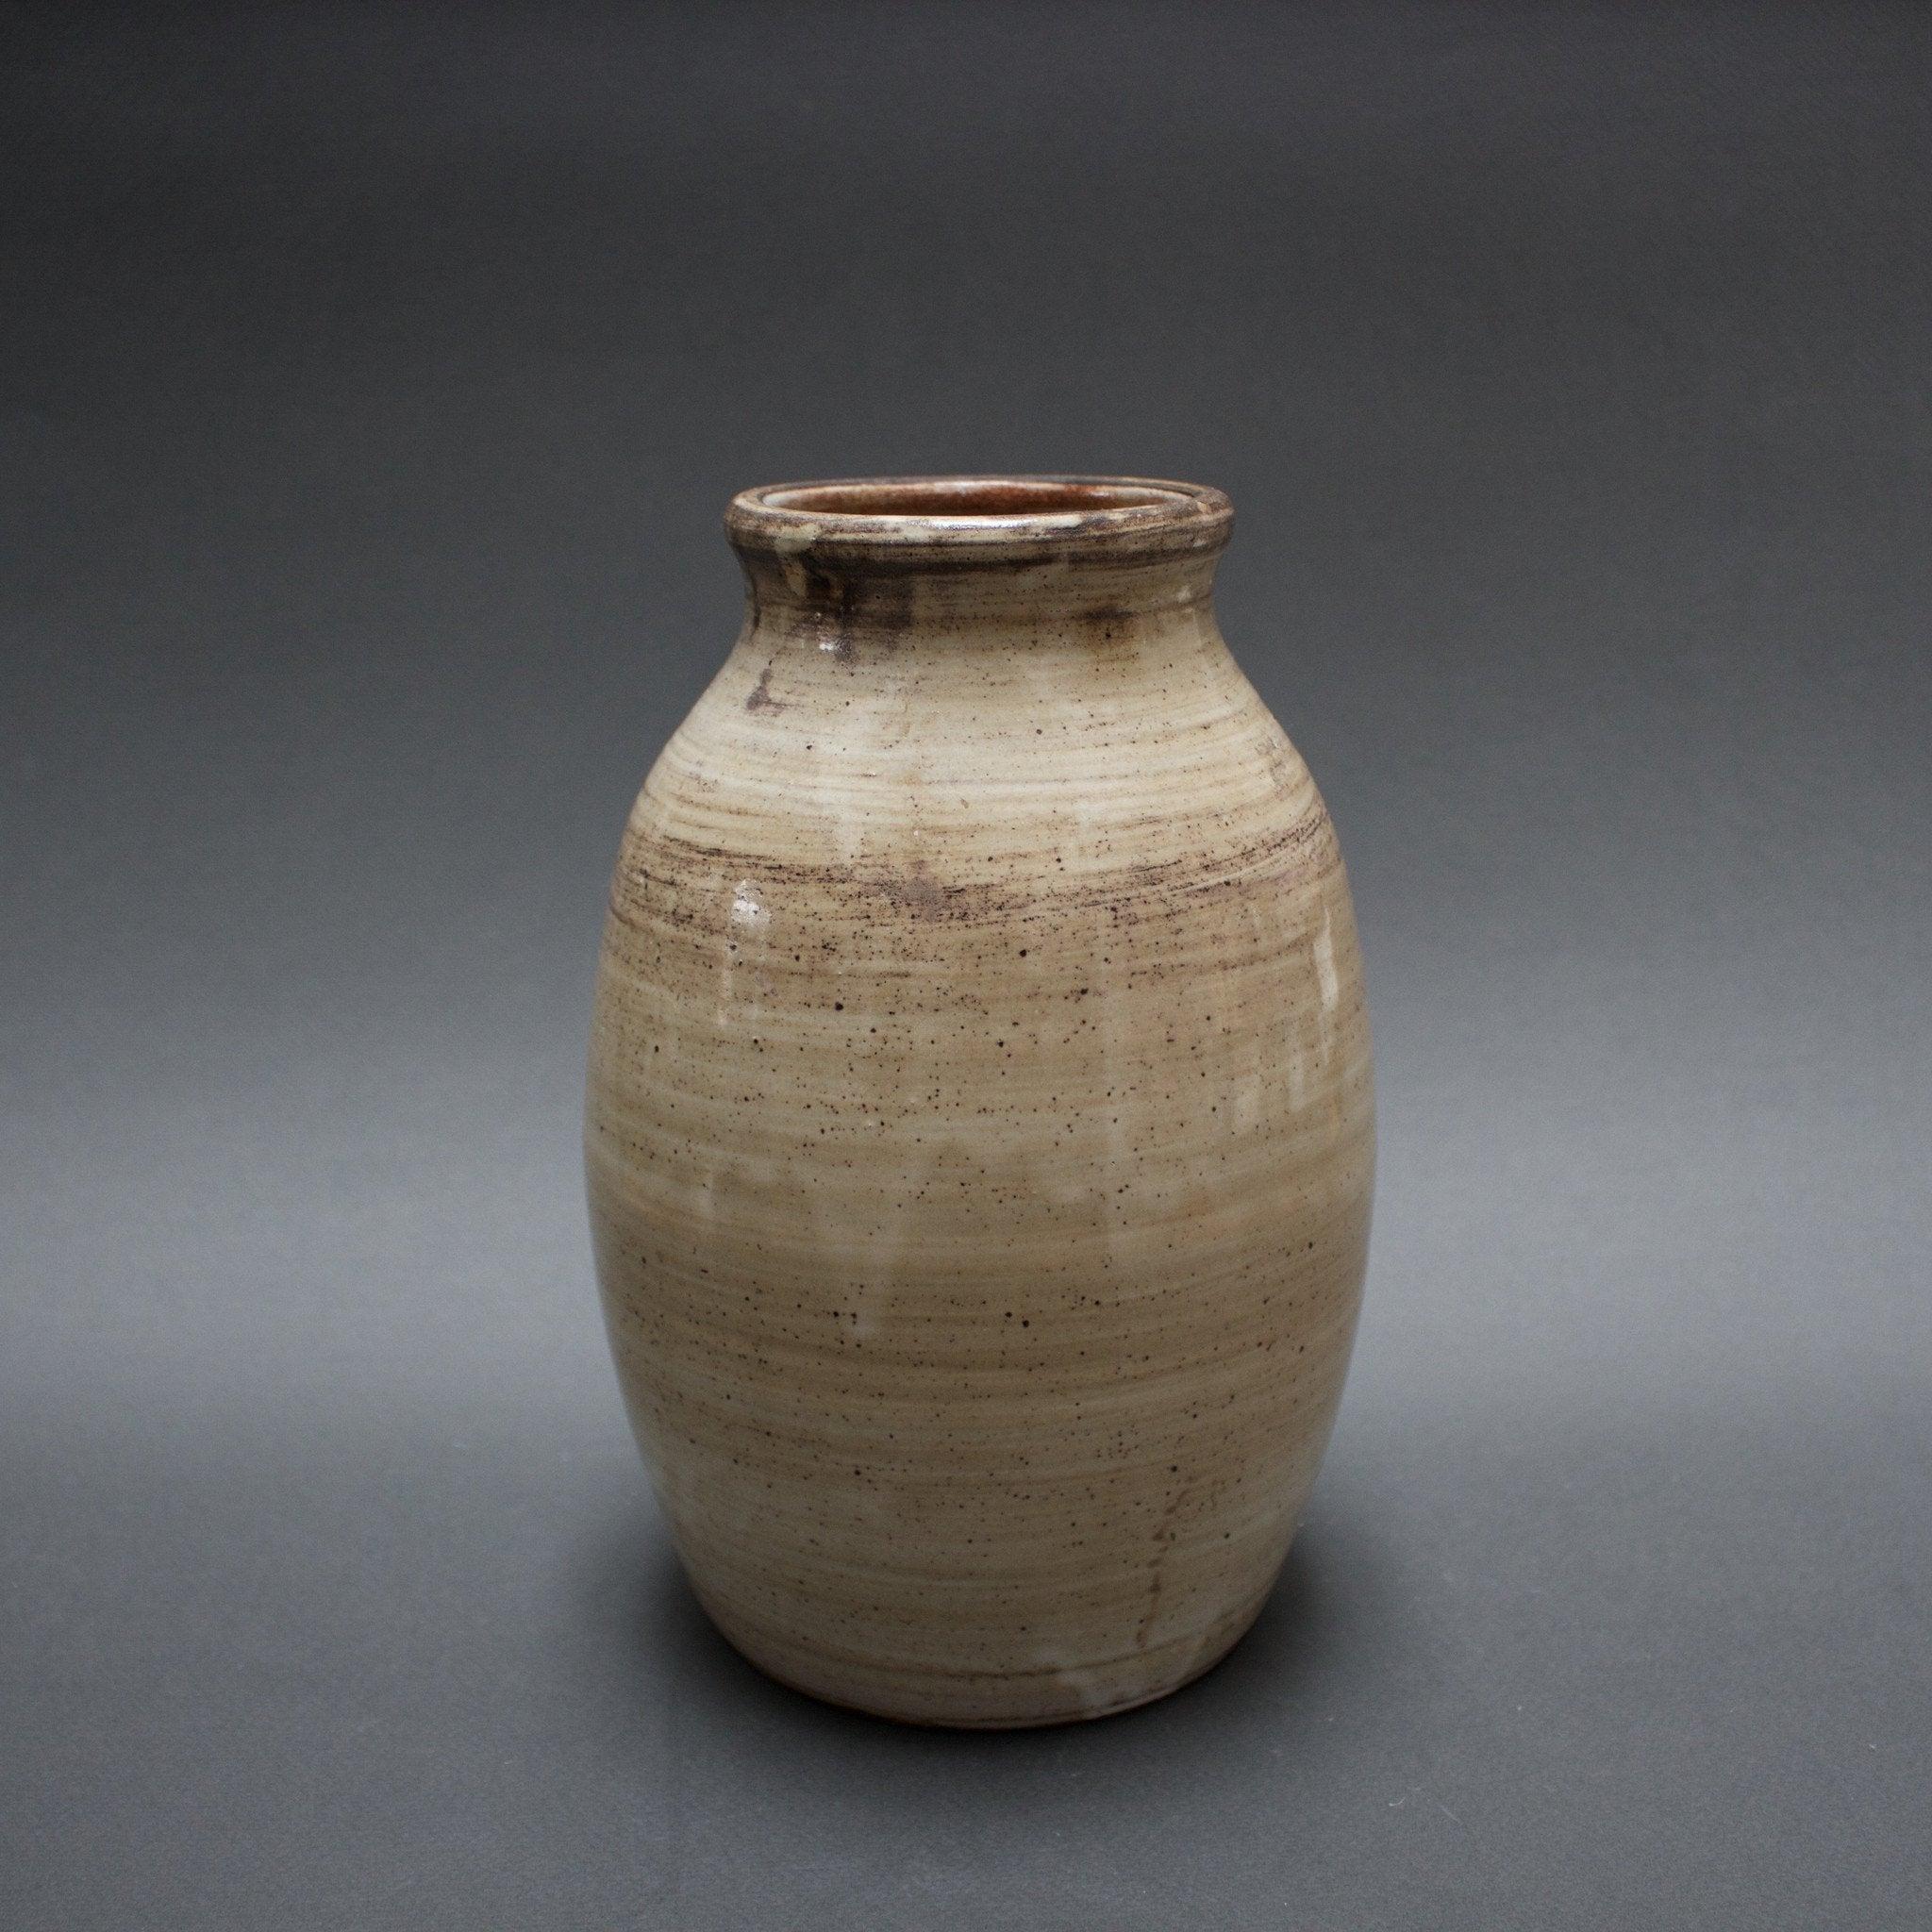 jacques pouchain midcentury ceramic vase circa 1960s at 1stdibs